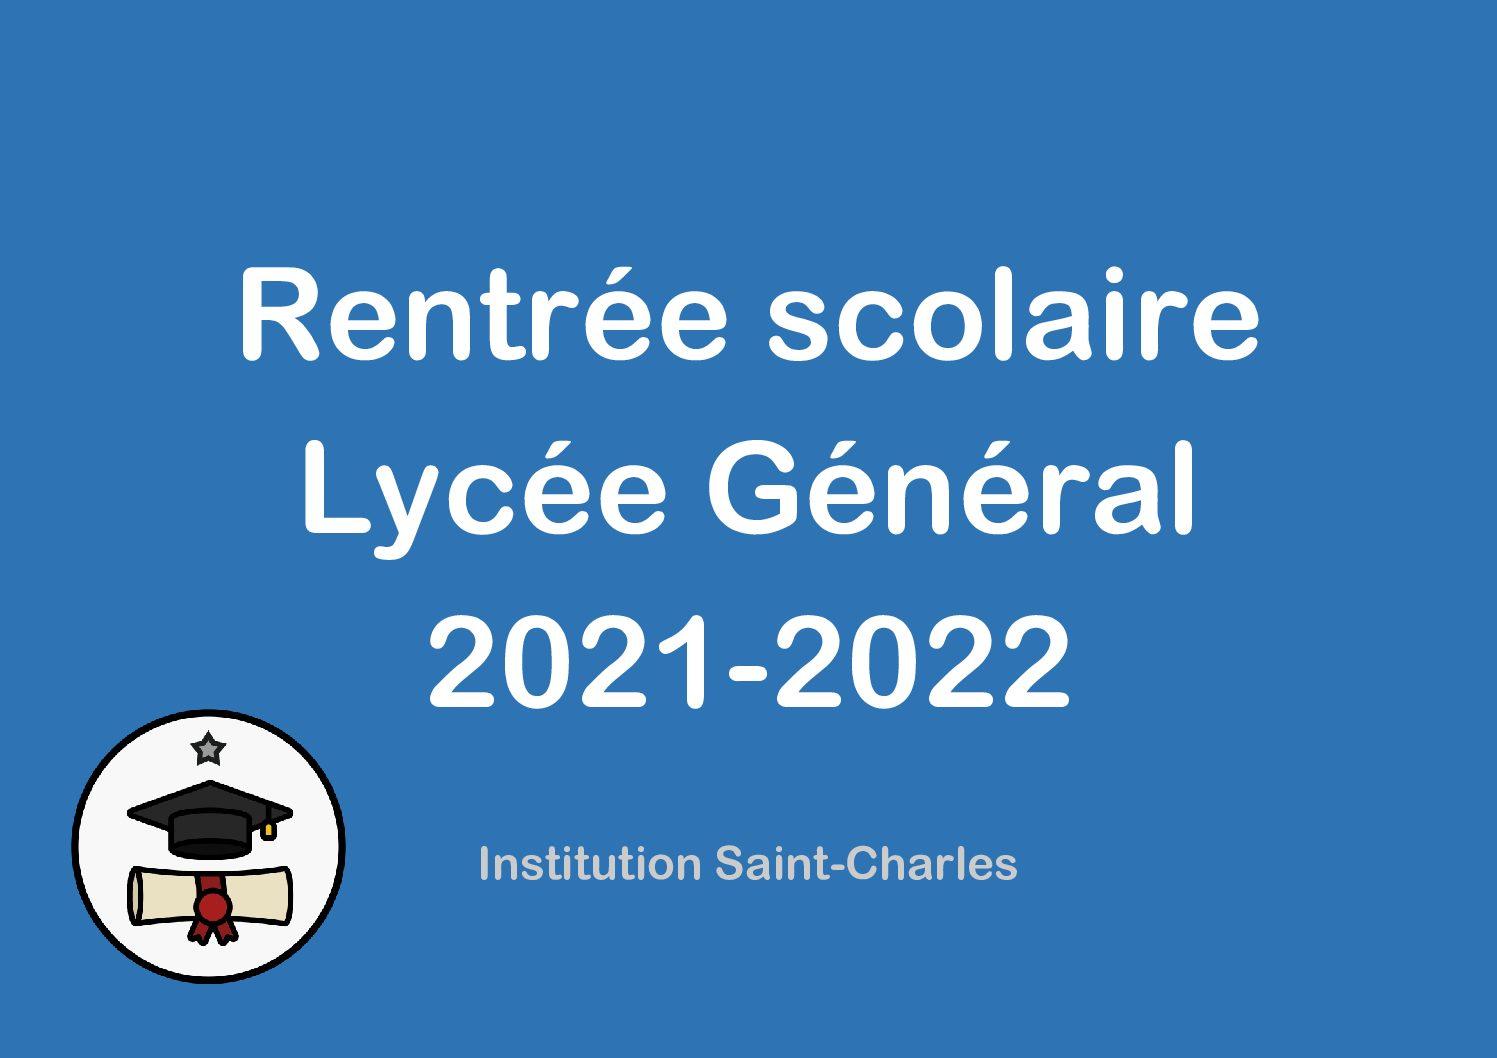 Rentrée 2021-2022 : Lycée Général